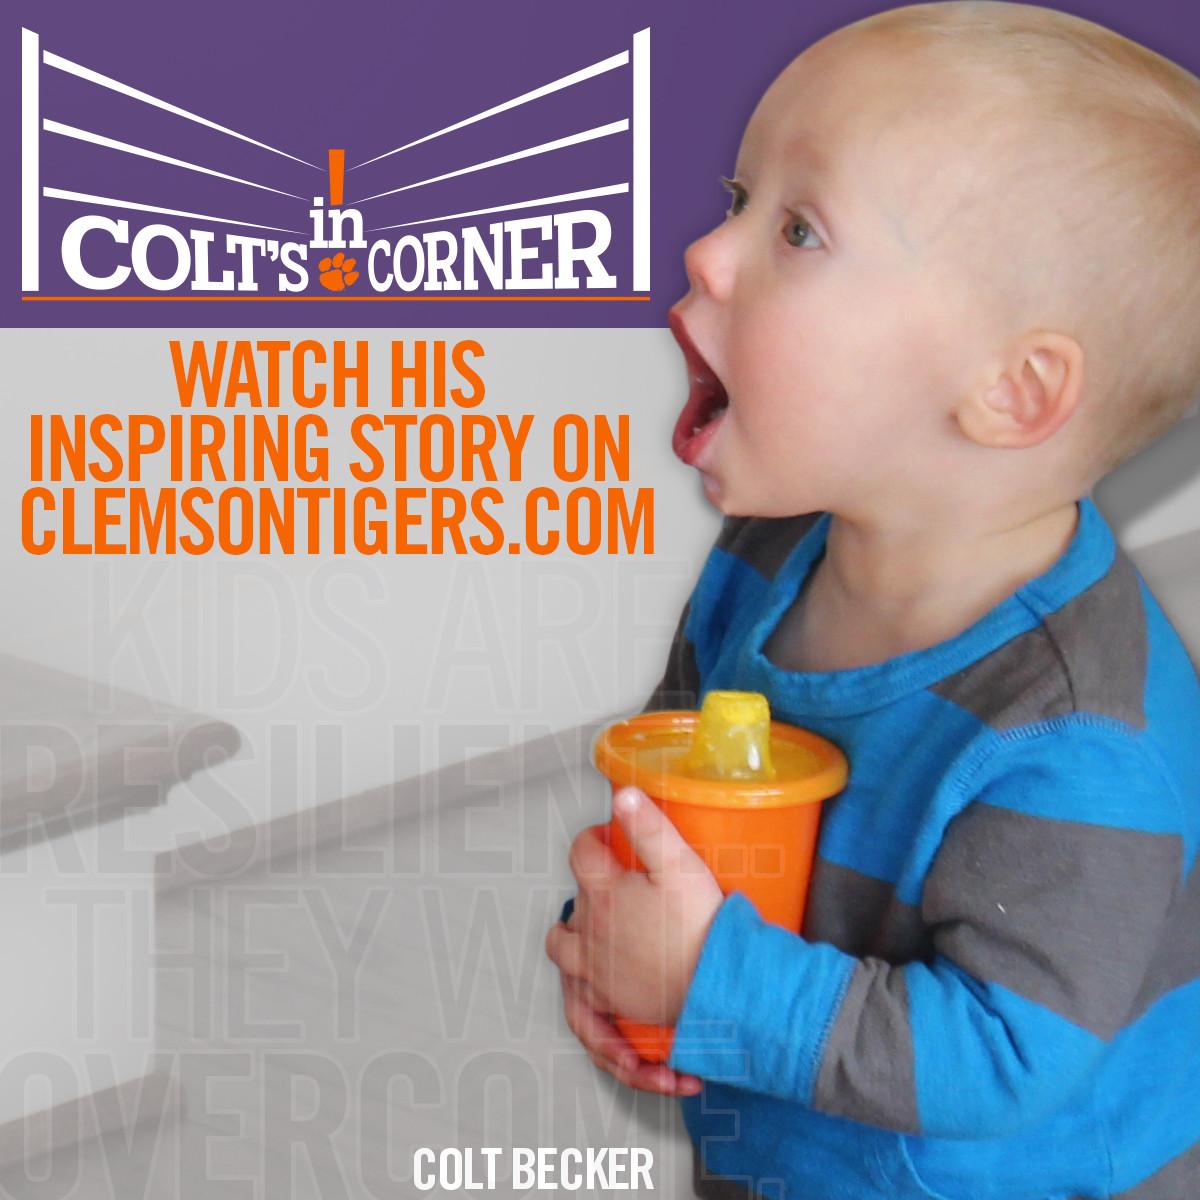 Documentary: In Colt's Corner